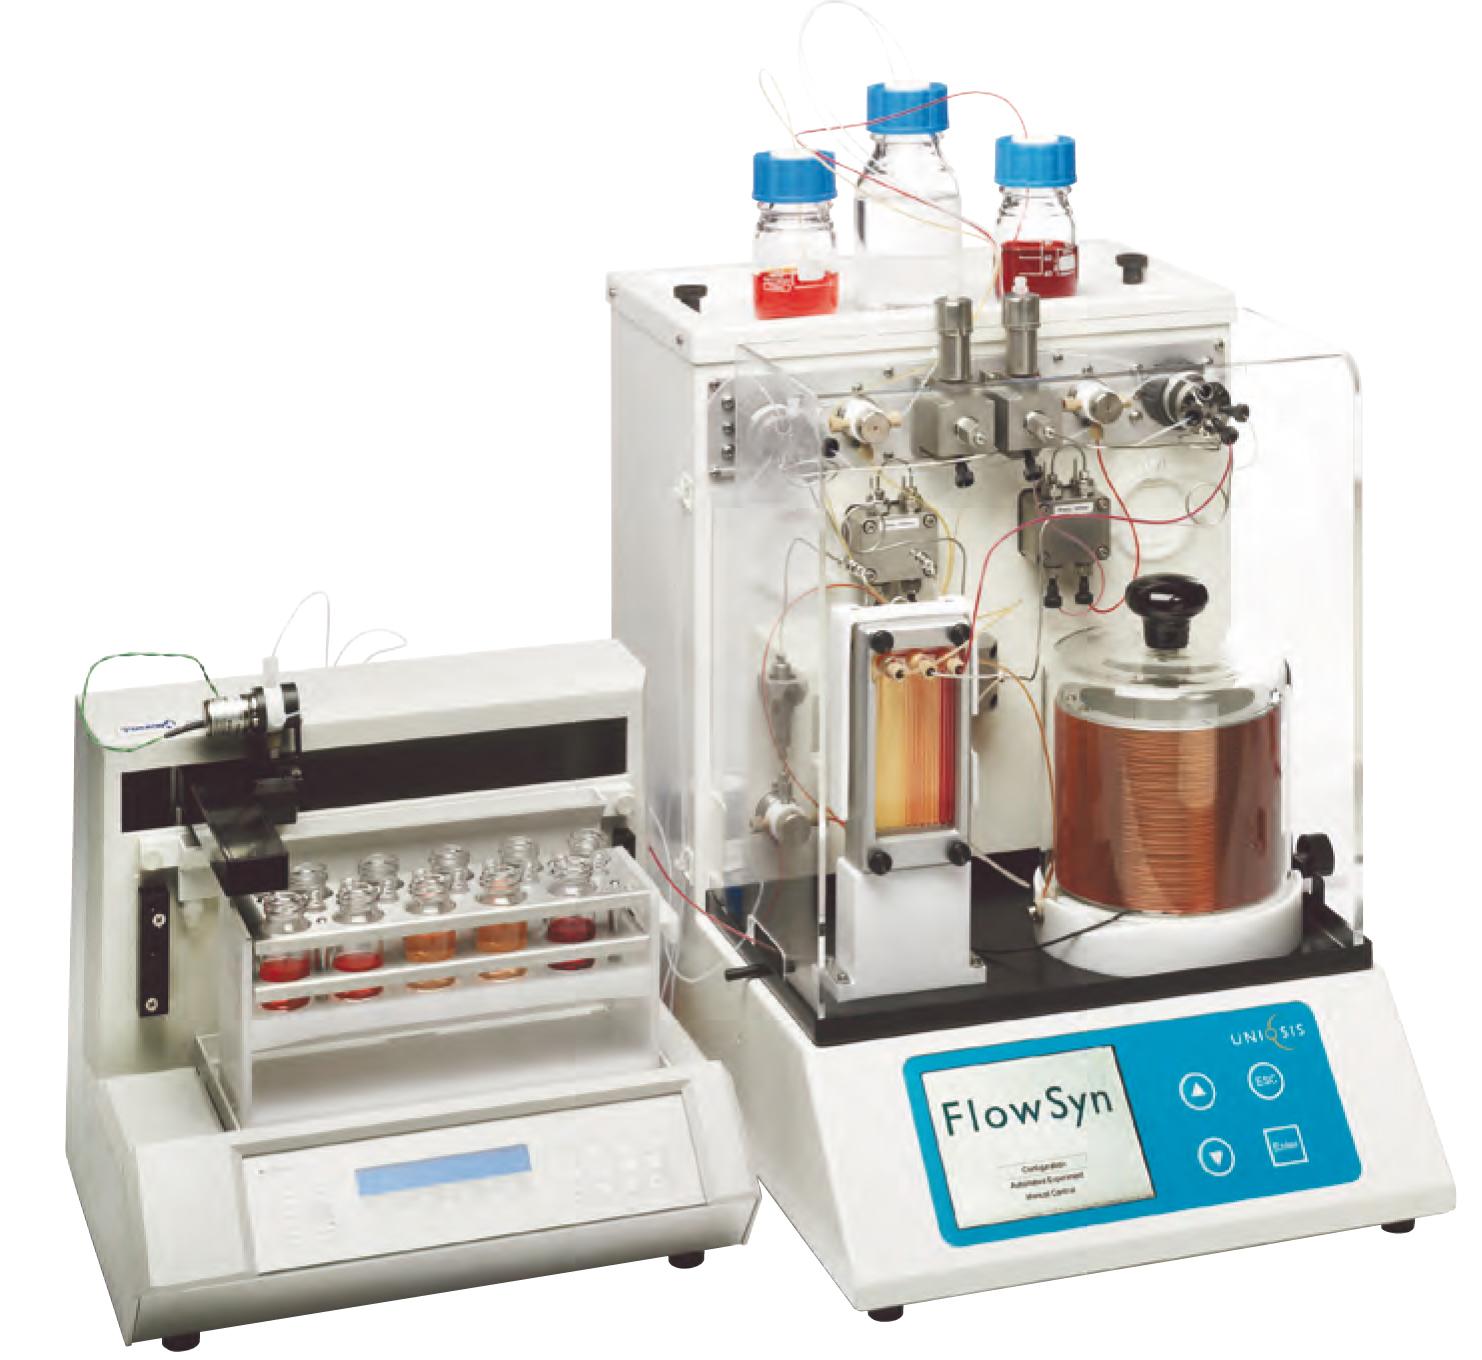 FlowSynMultiX_Flow_Chemistry_Interchim_blog_0616